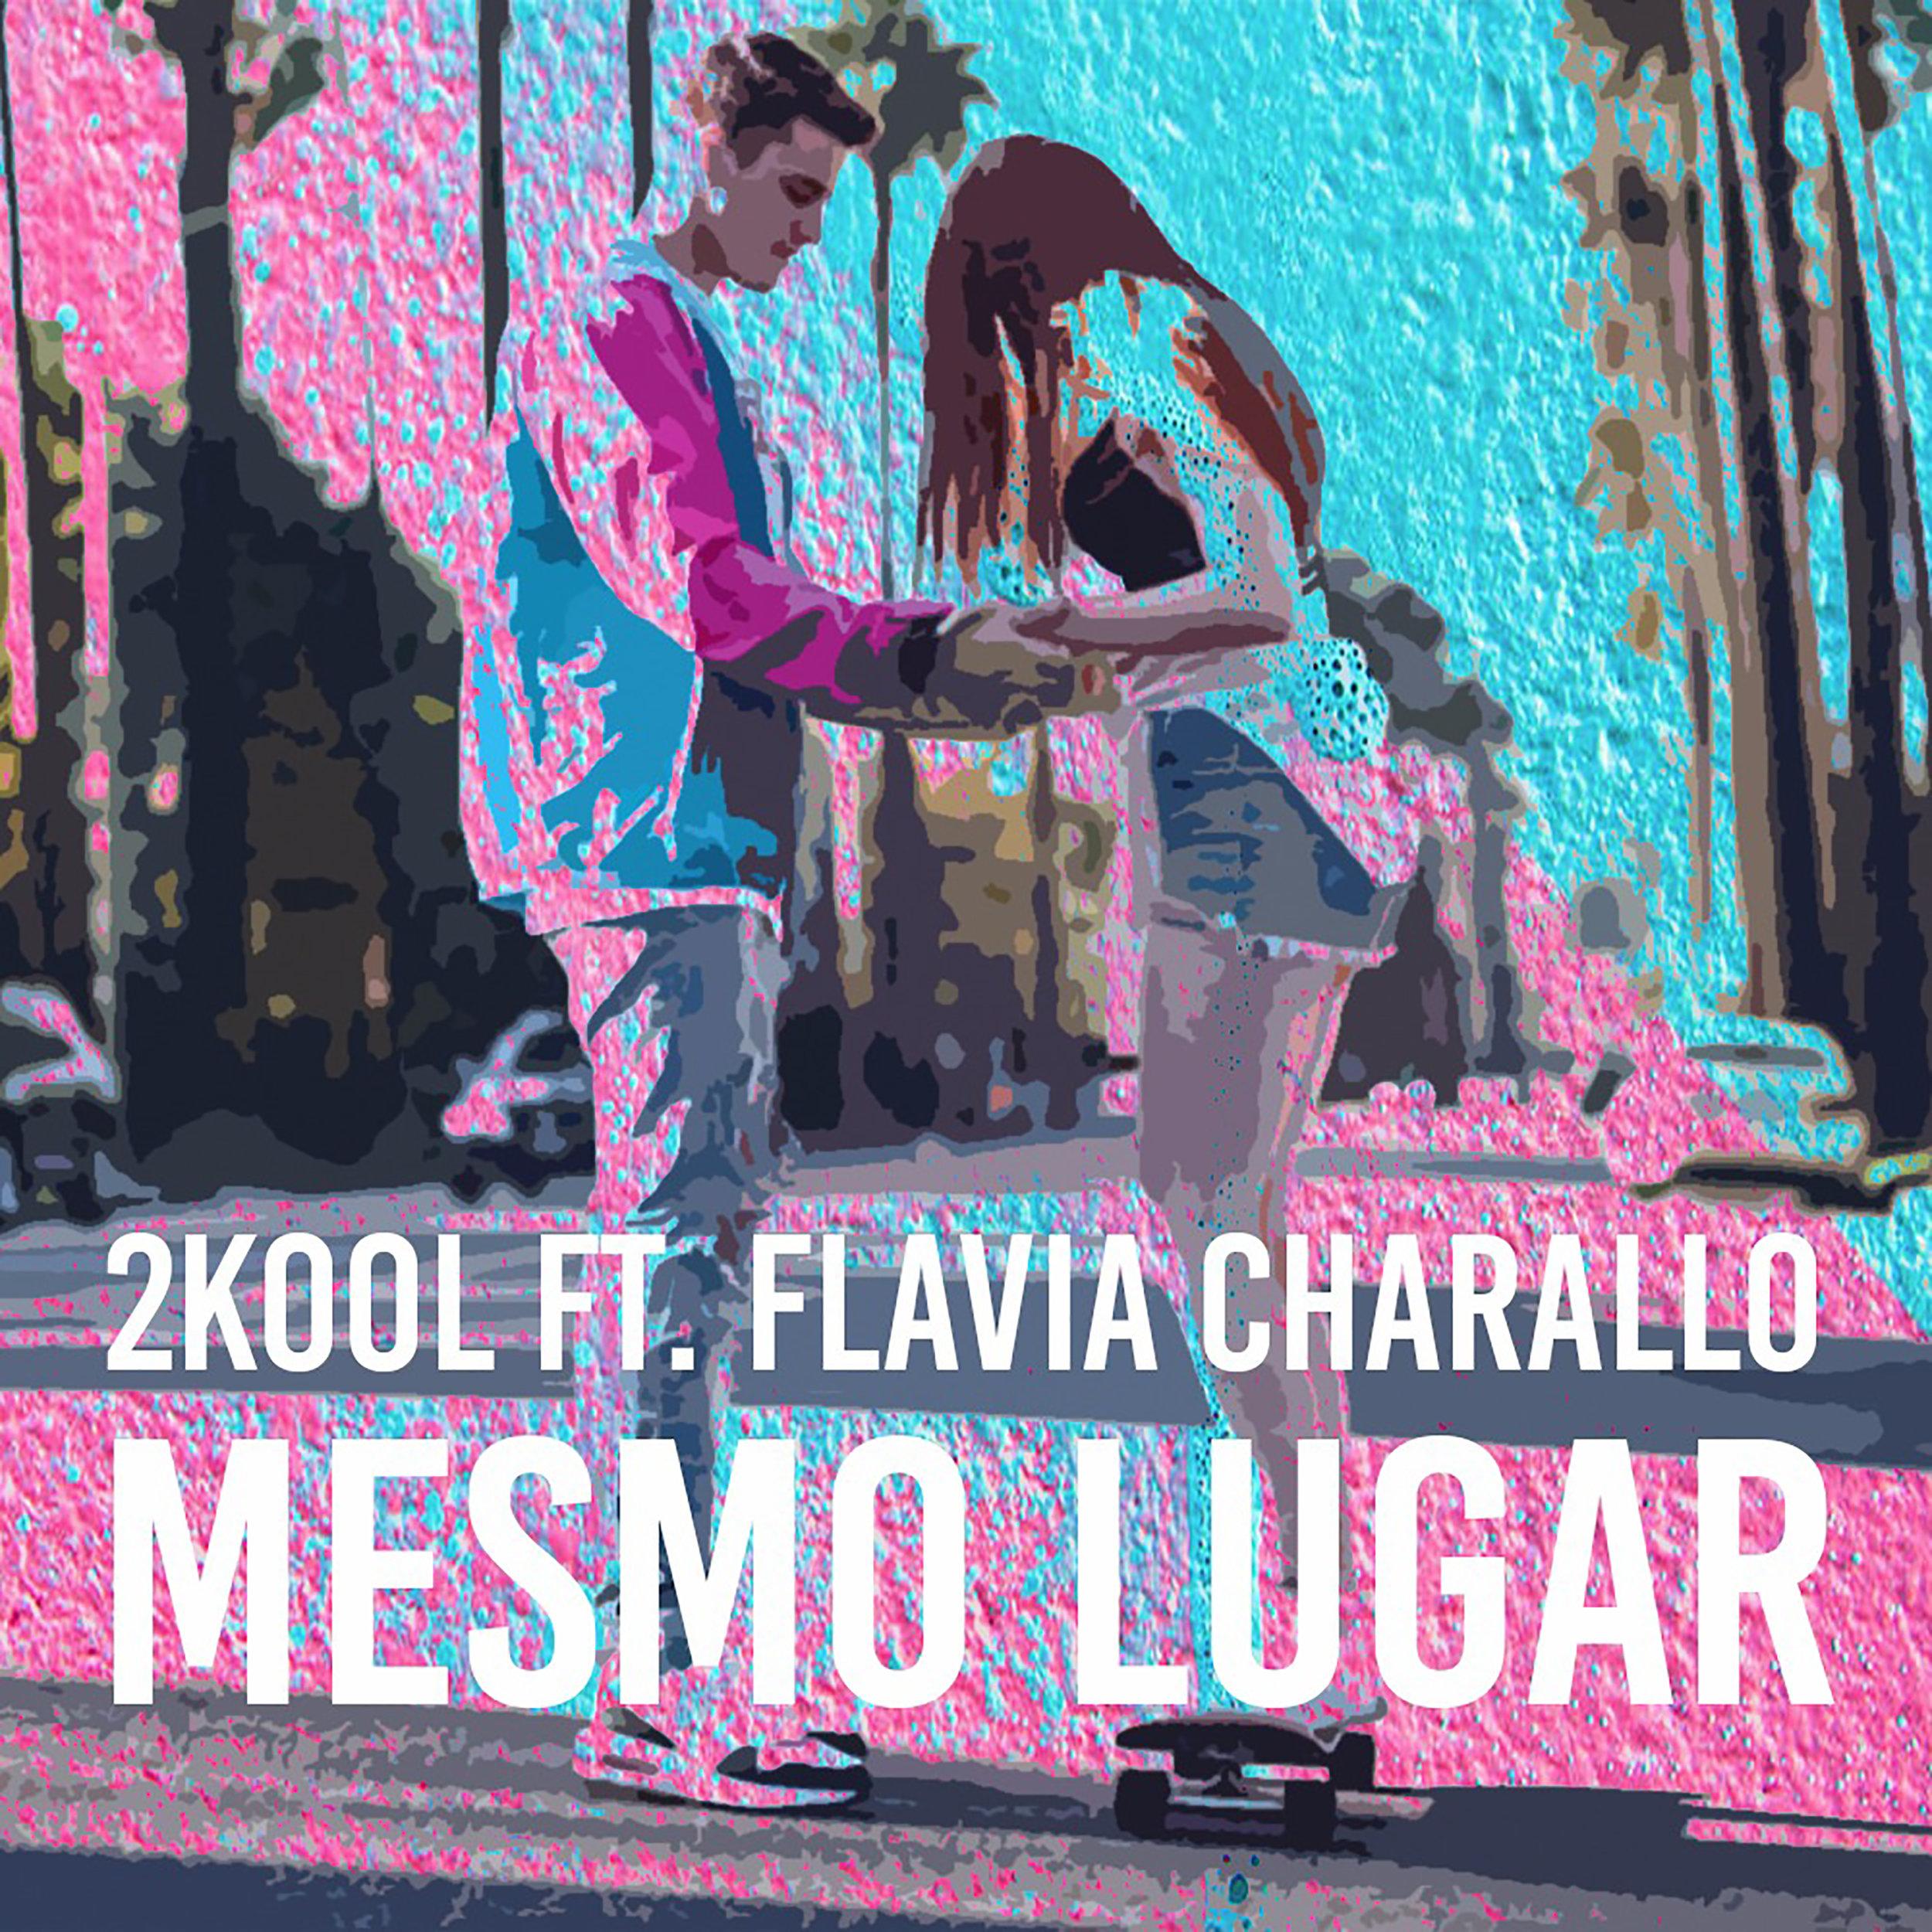 Copy of 2Kool, Flavia Charallo